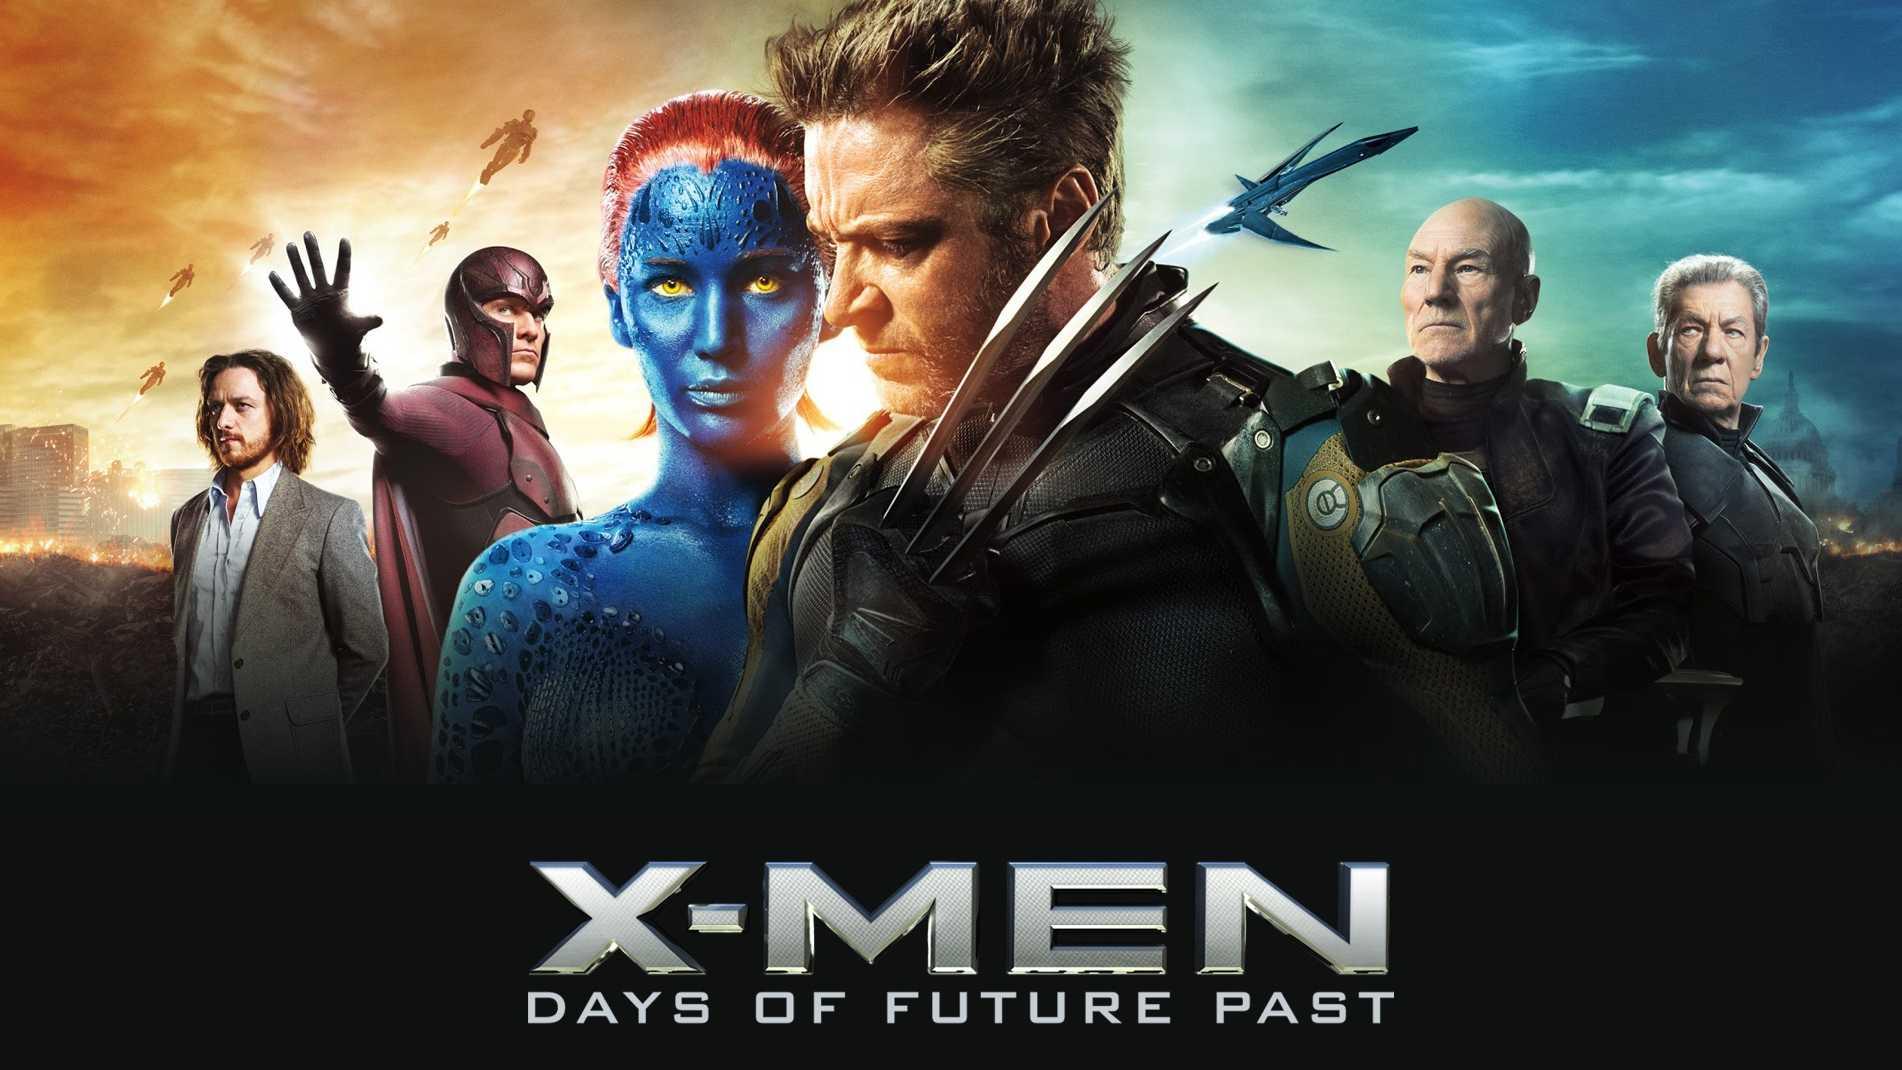 X-Men-Days-of-Future-Past-Banner-2014-Poster-hdpics.jpg